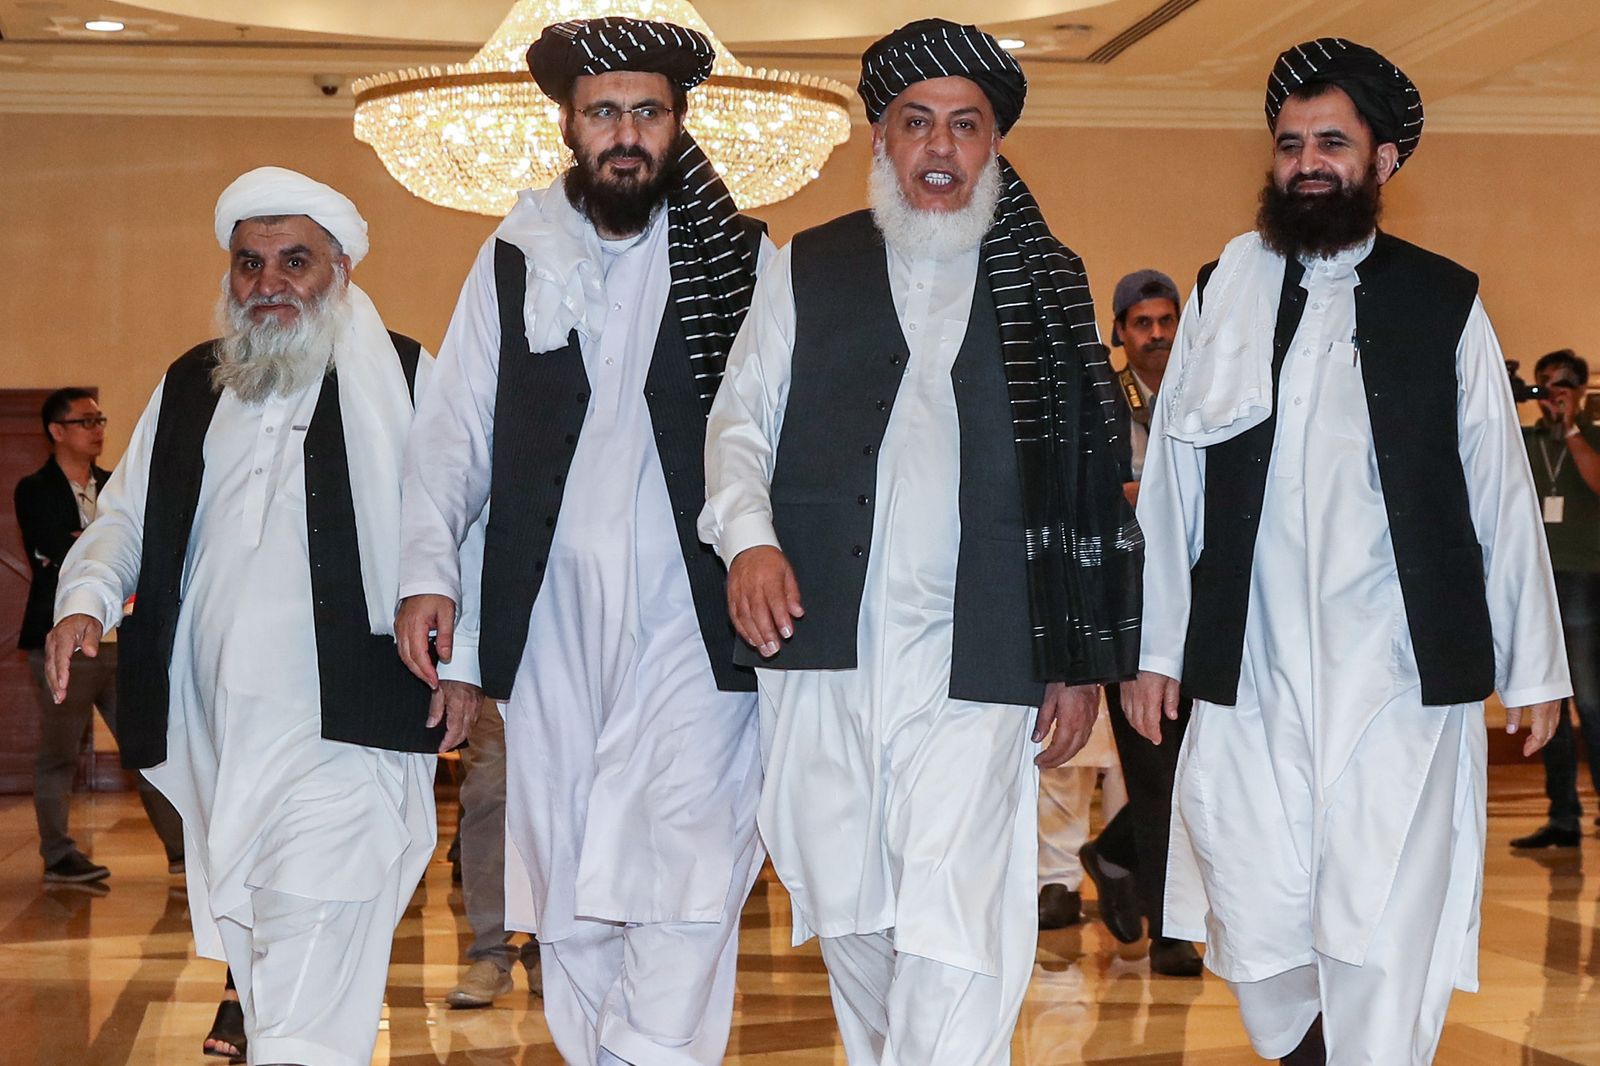 FILES-QATAR-US-AFGHANISTAN-TALIBAN-DIPLOMACY-PEACE-CONFLICT-poli